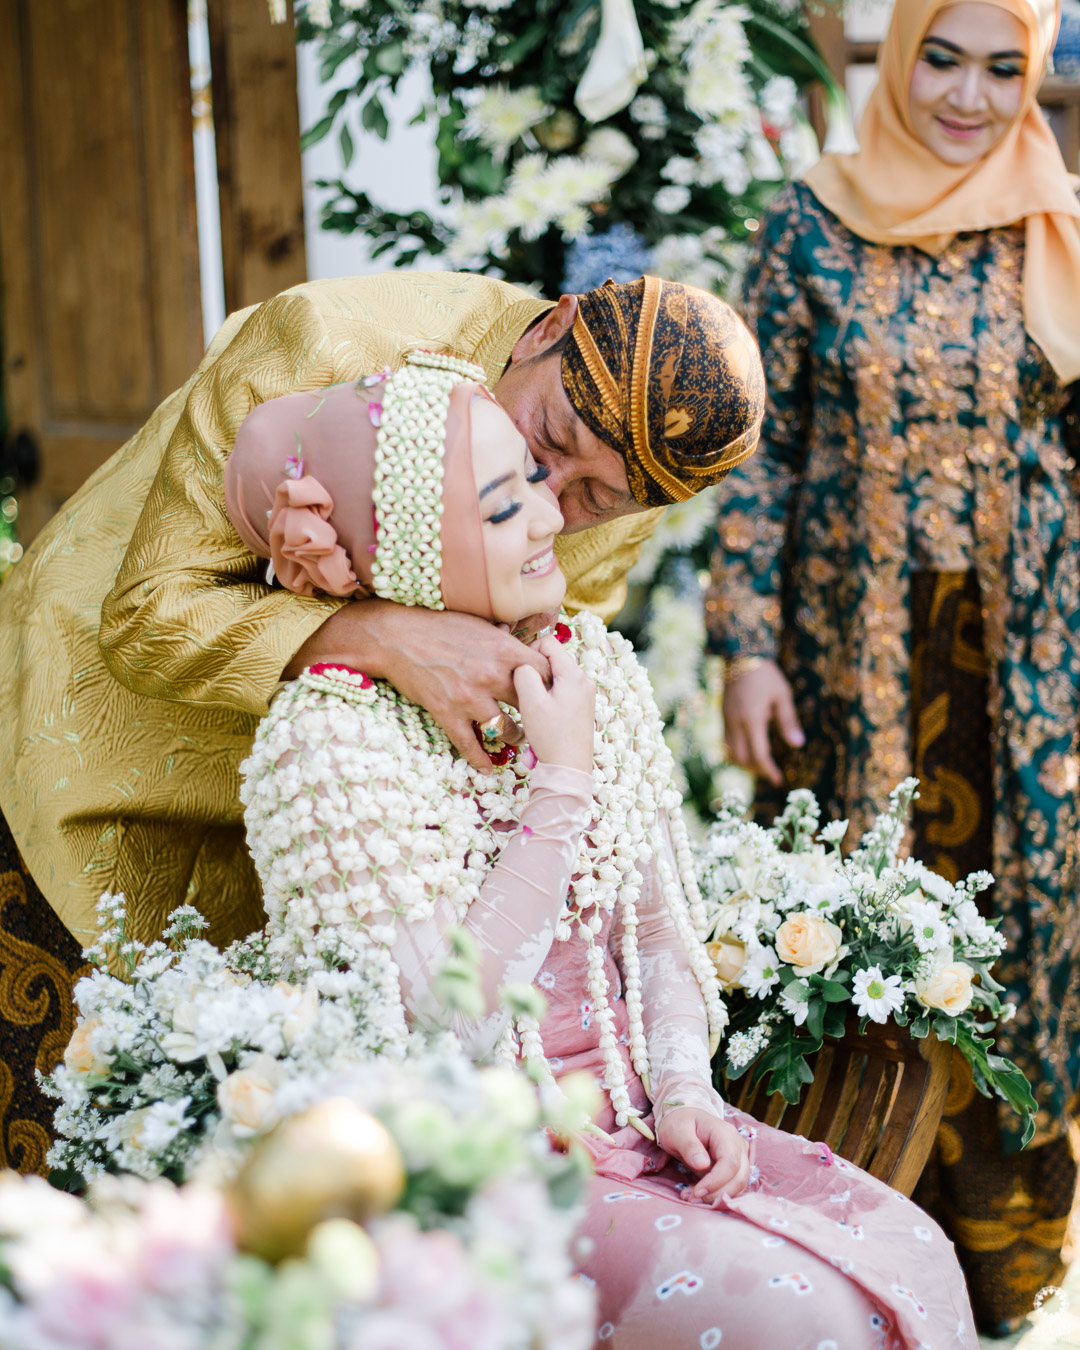 DSCF1192 : Bella & Fahmi Wedding